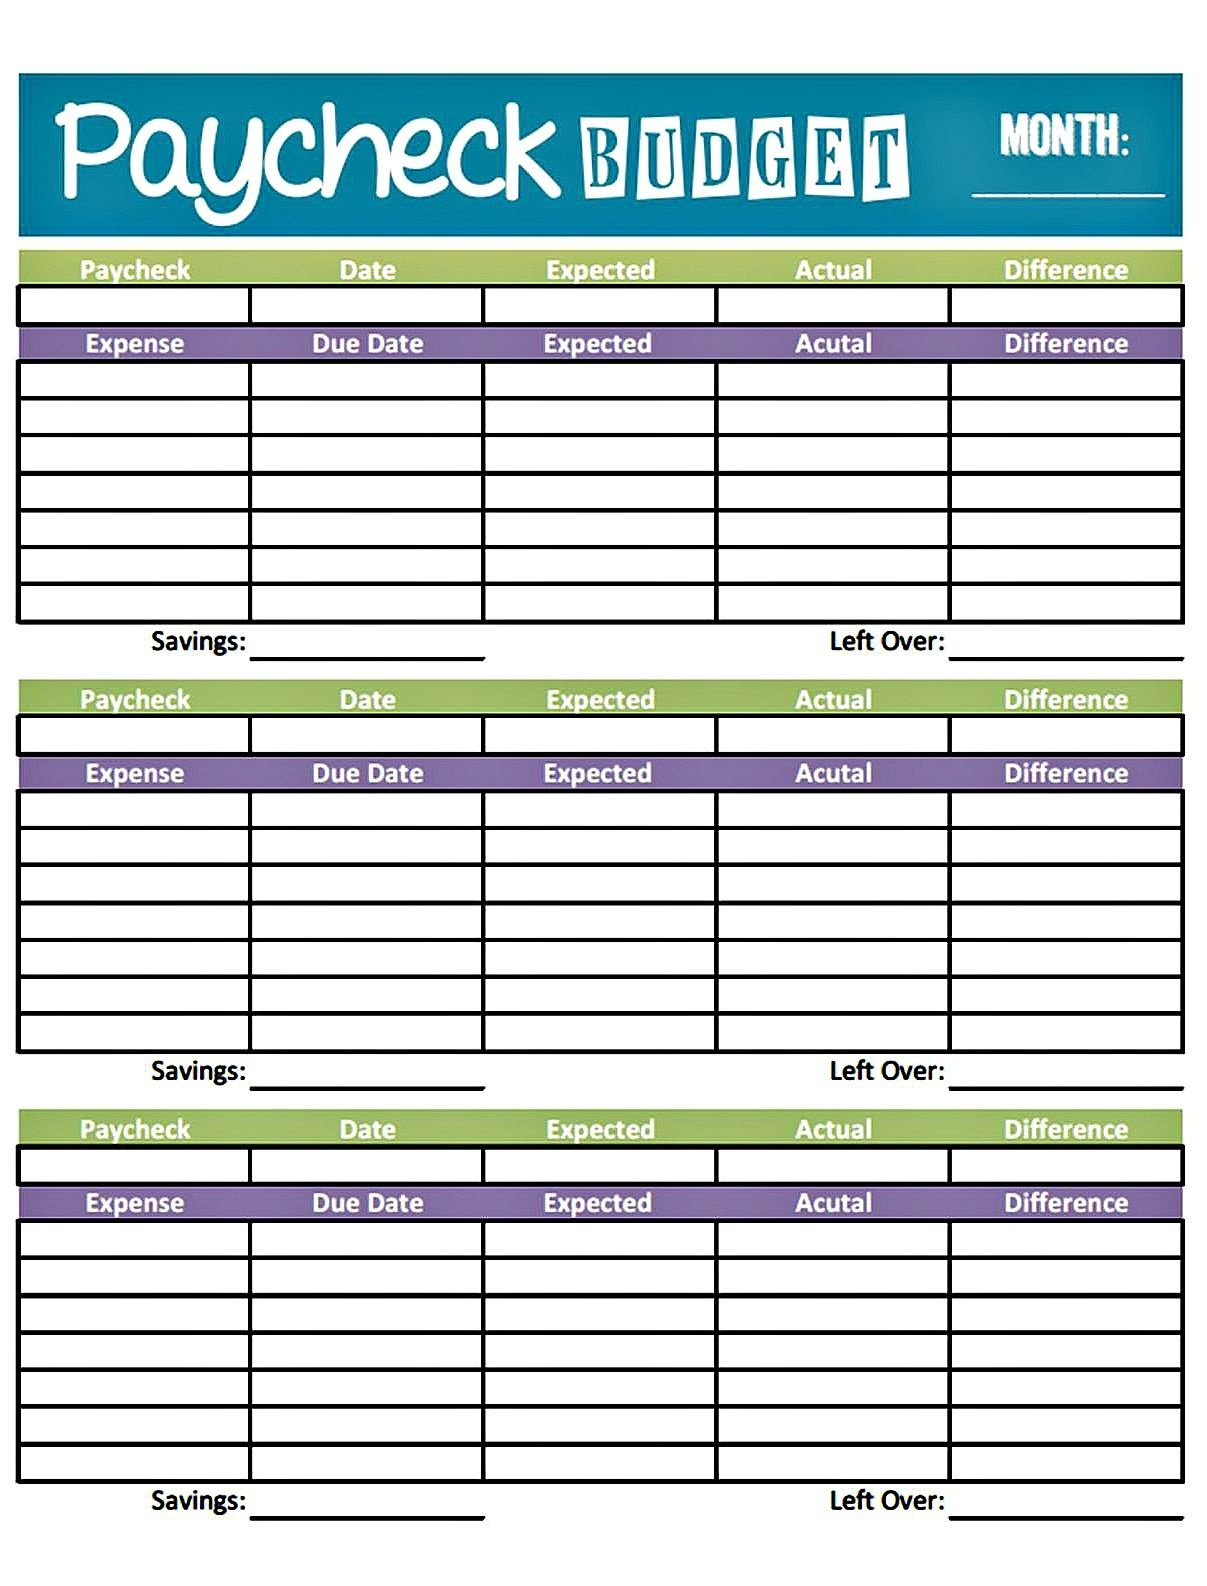 Budget Worksheet Printable | Get Paid Weekly And Charlie Gets Paid - Free Printable Bi Weekly Budget Template